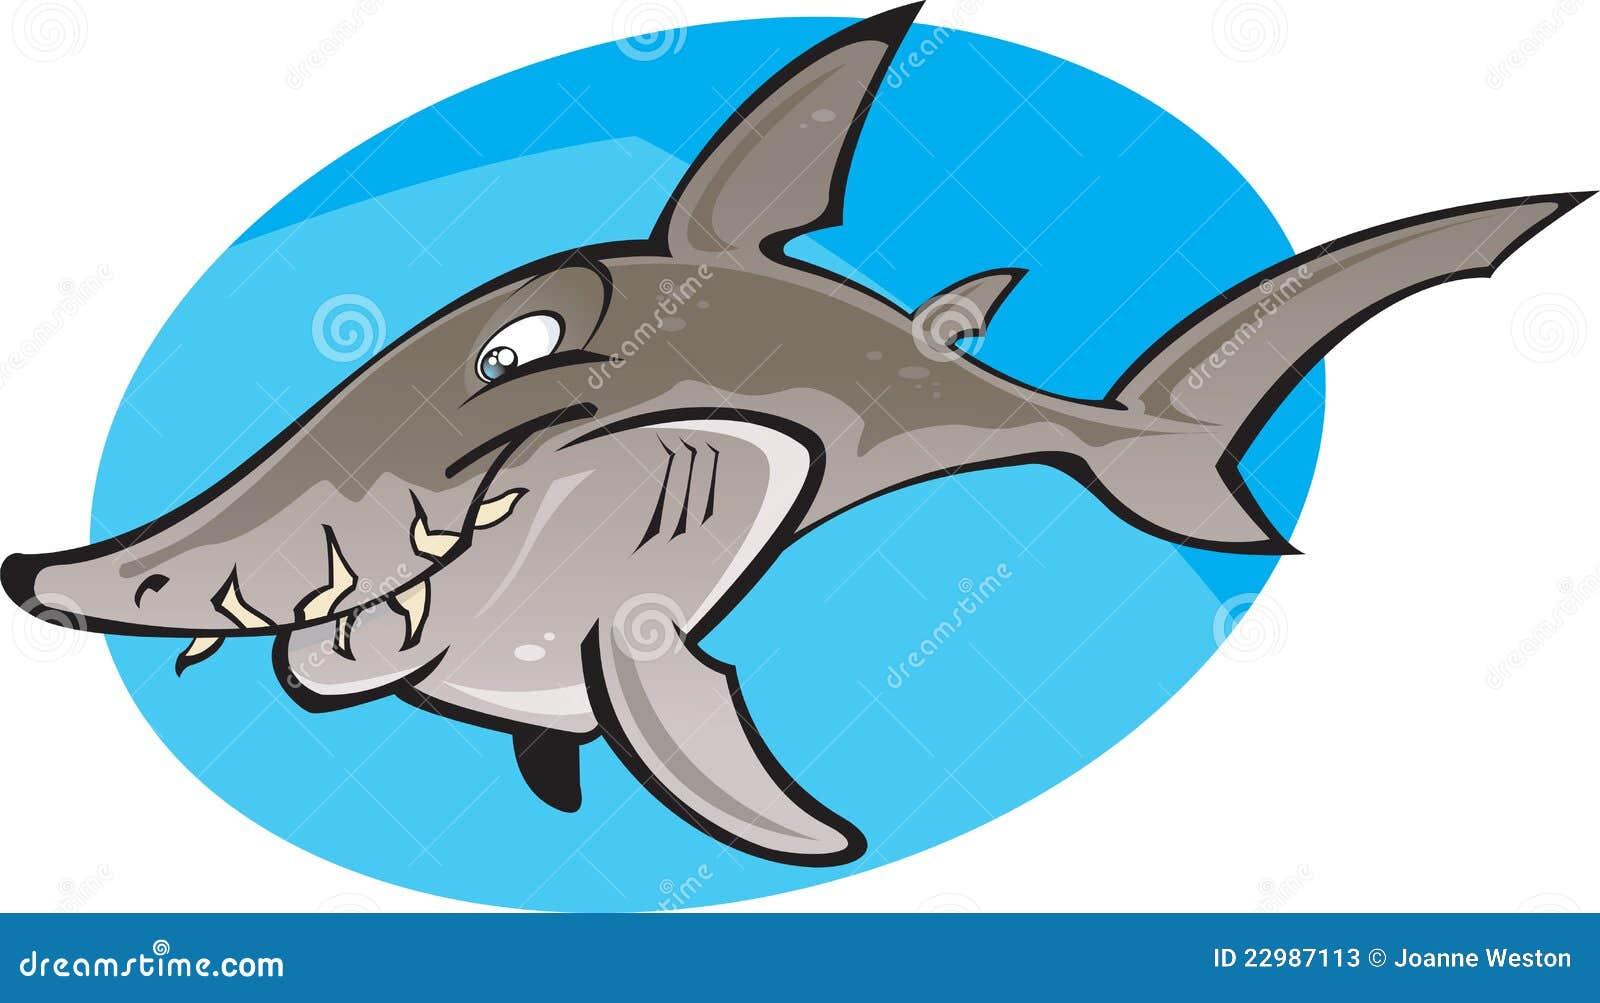 Nurse shark drawing